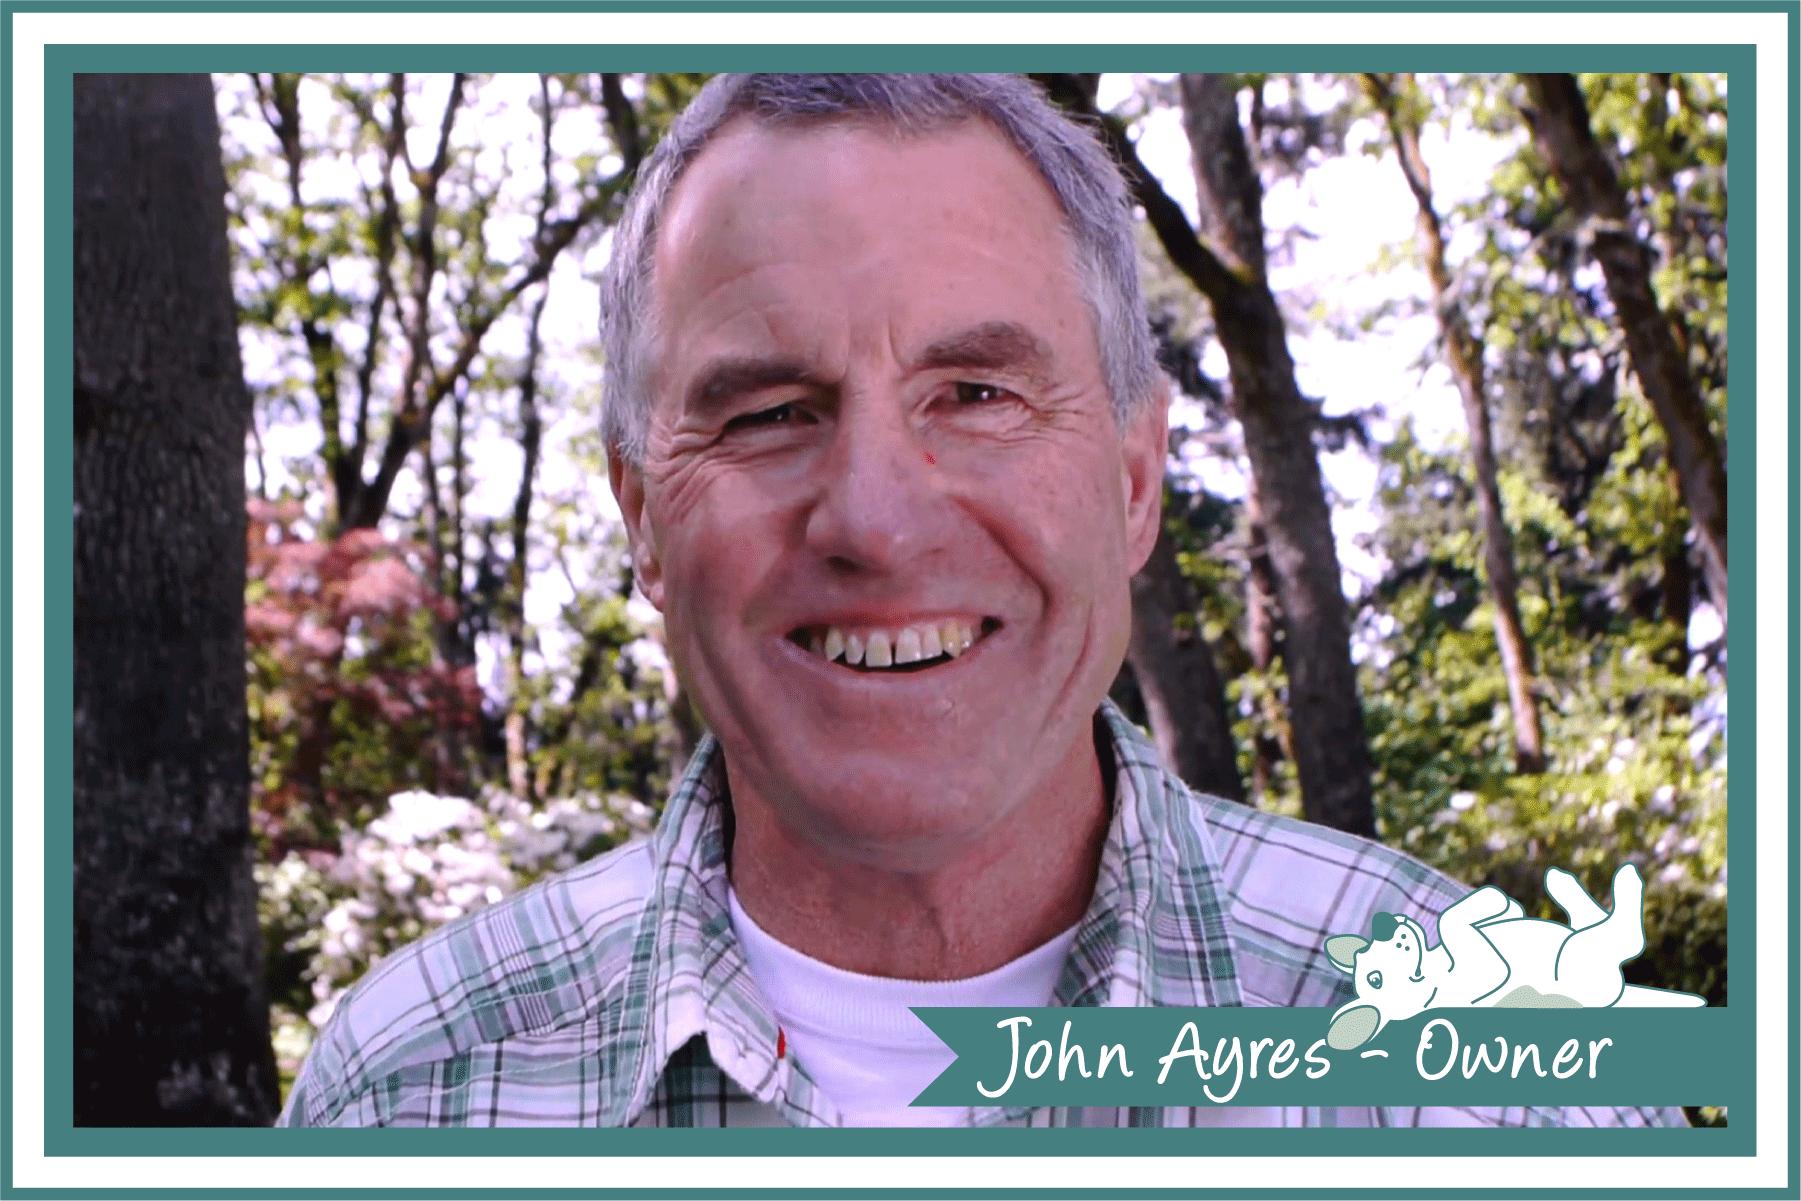 John Ayres, Owner/Operator of Dog Gone Clean.